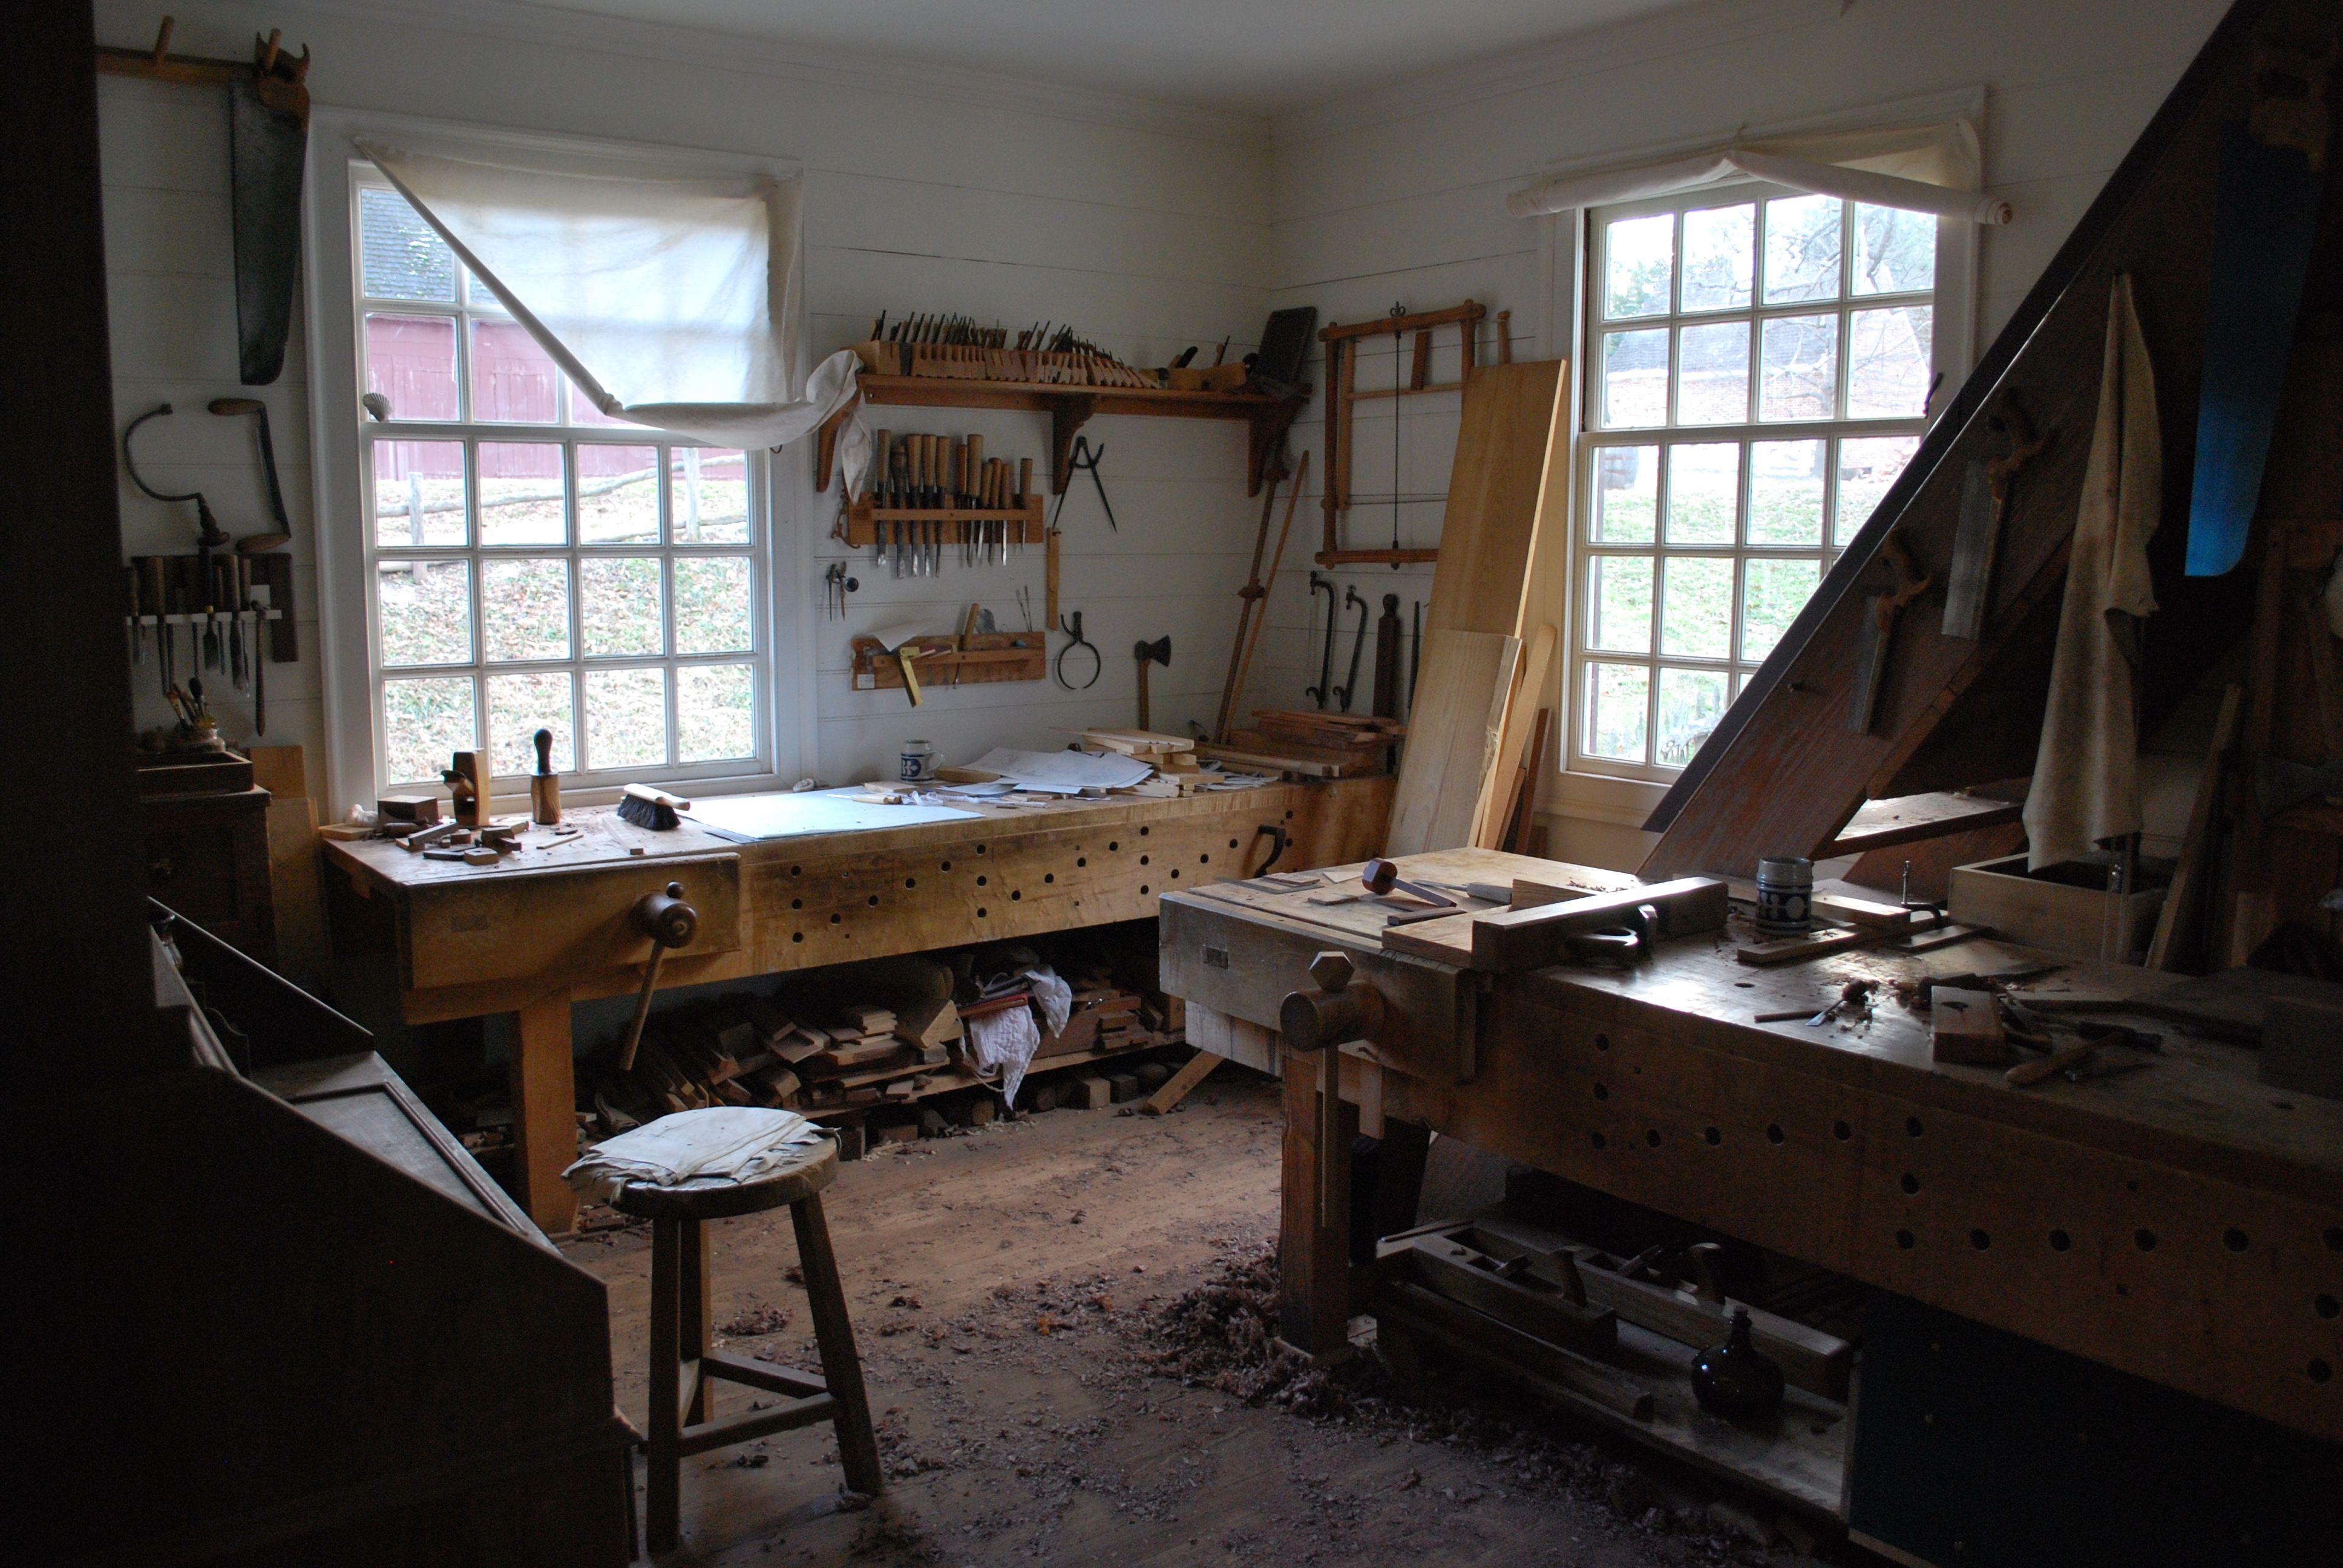 Anthony Hay Workshop @ Colonial Williamsburg | Workshops | Woodworking workshop, Woodworking ...